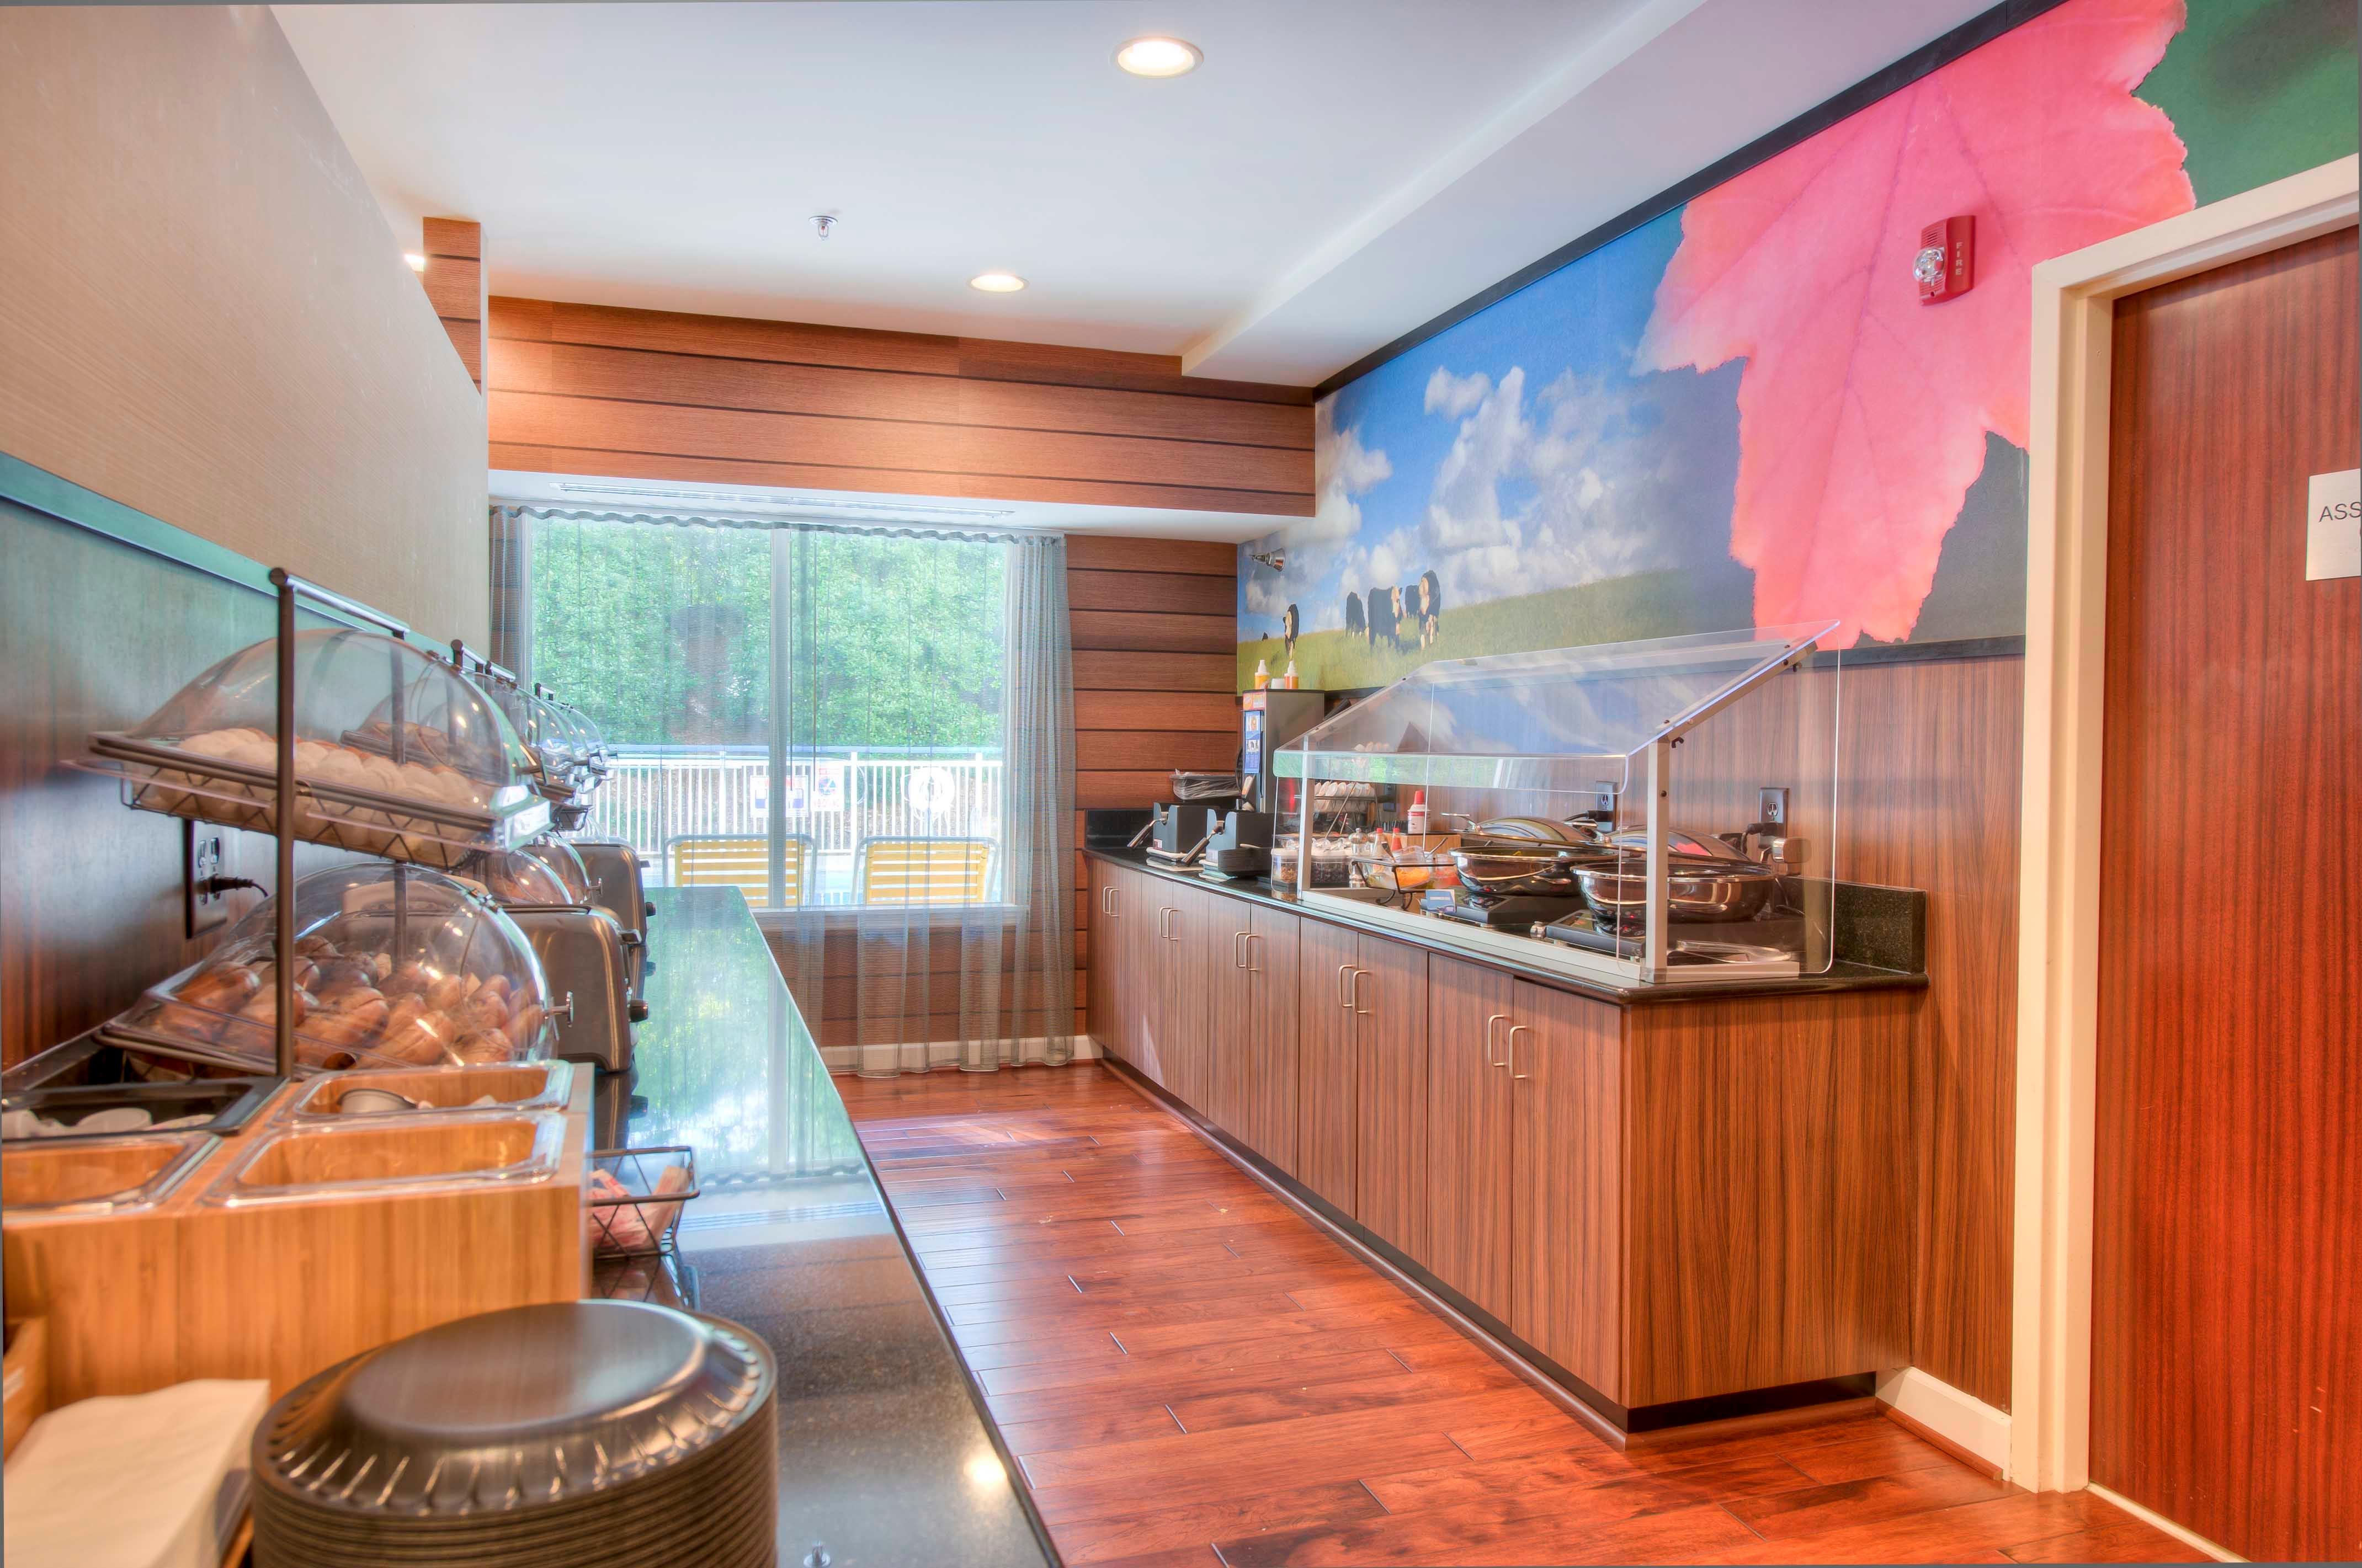 Fairfield Inn & Suites by Marriott Raleigh Crabtree Valley image 2